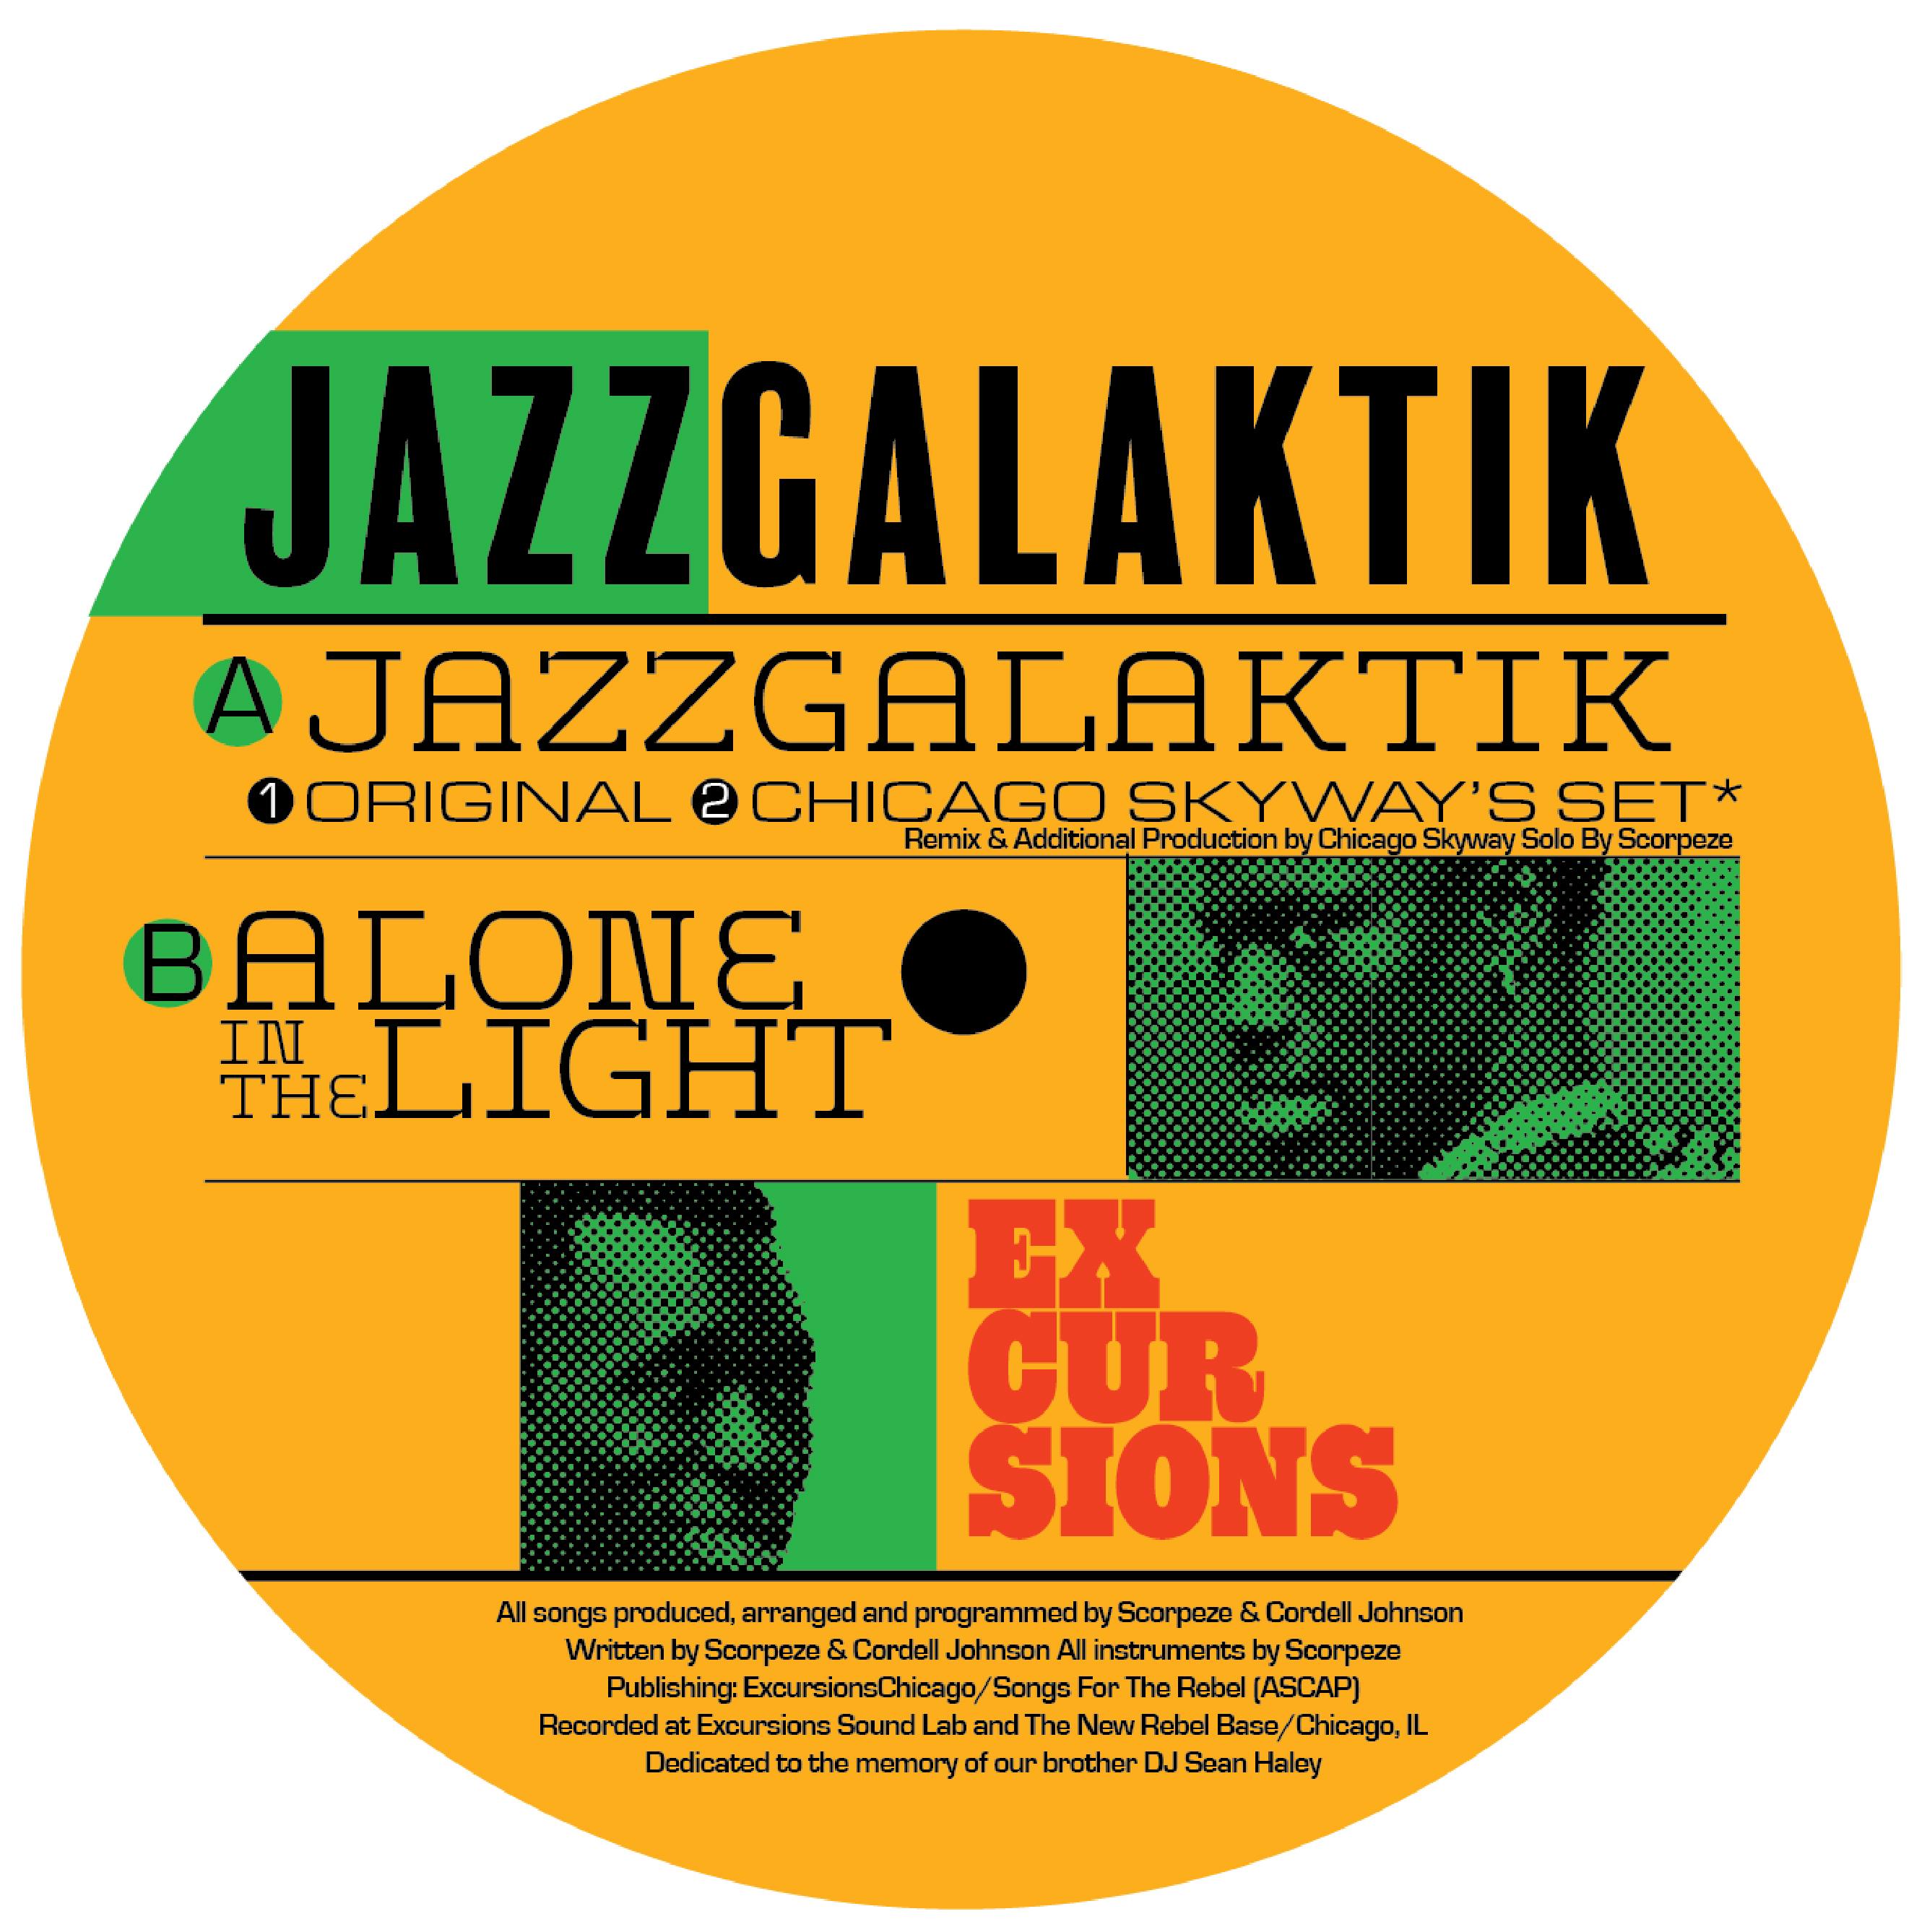 "C Johnson & Scorpeze/JAZZGALAKTIK 12"""